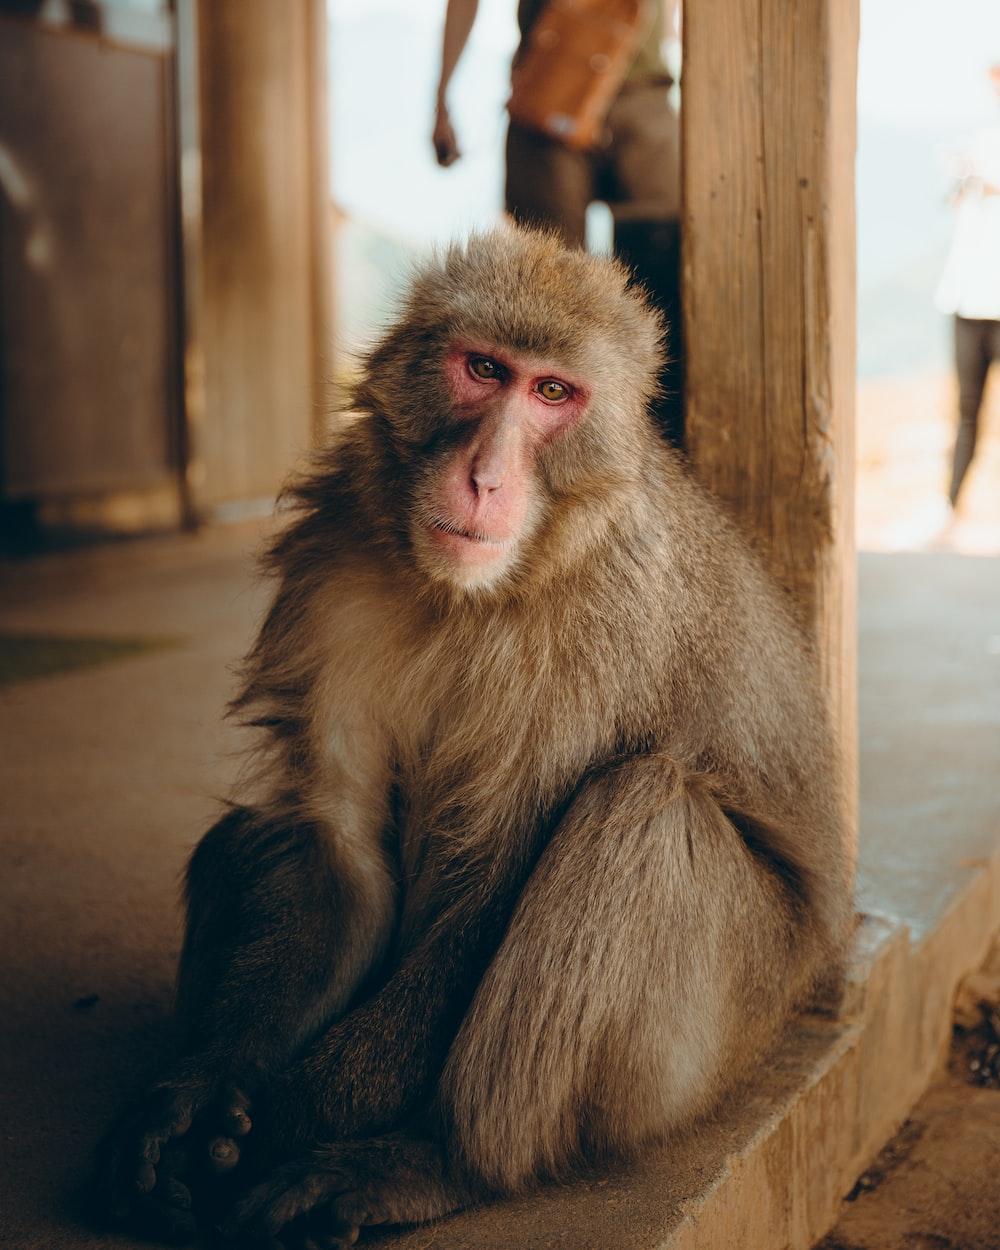 brown monkey on floor